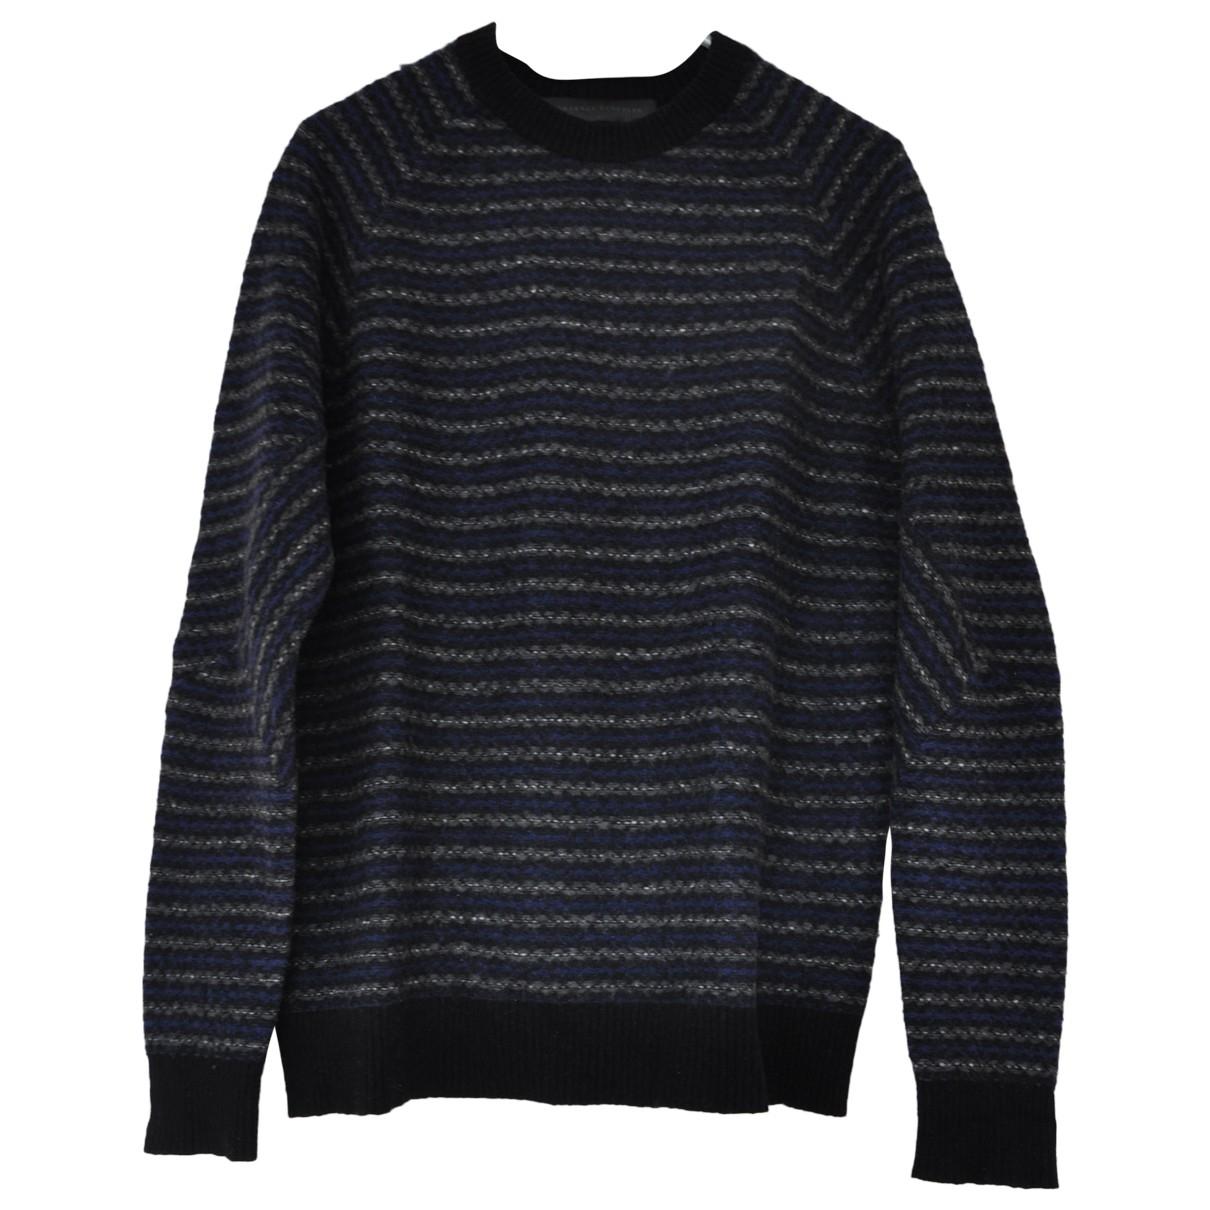 Proenza Schouler \N Multicolour Cashmere Knitwear for Women M International